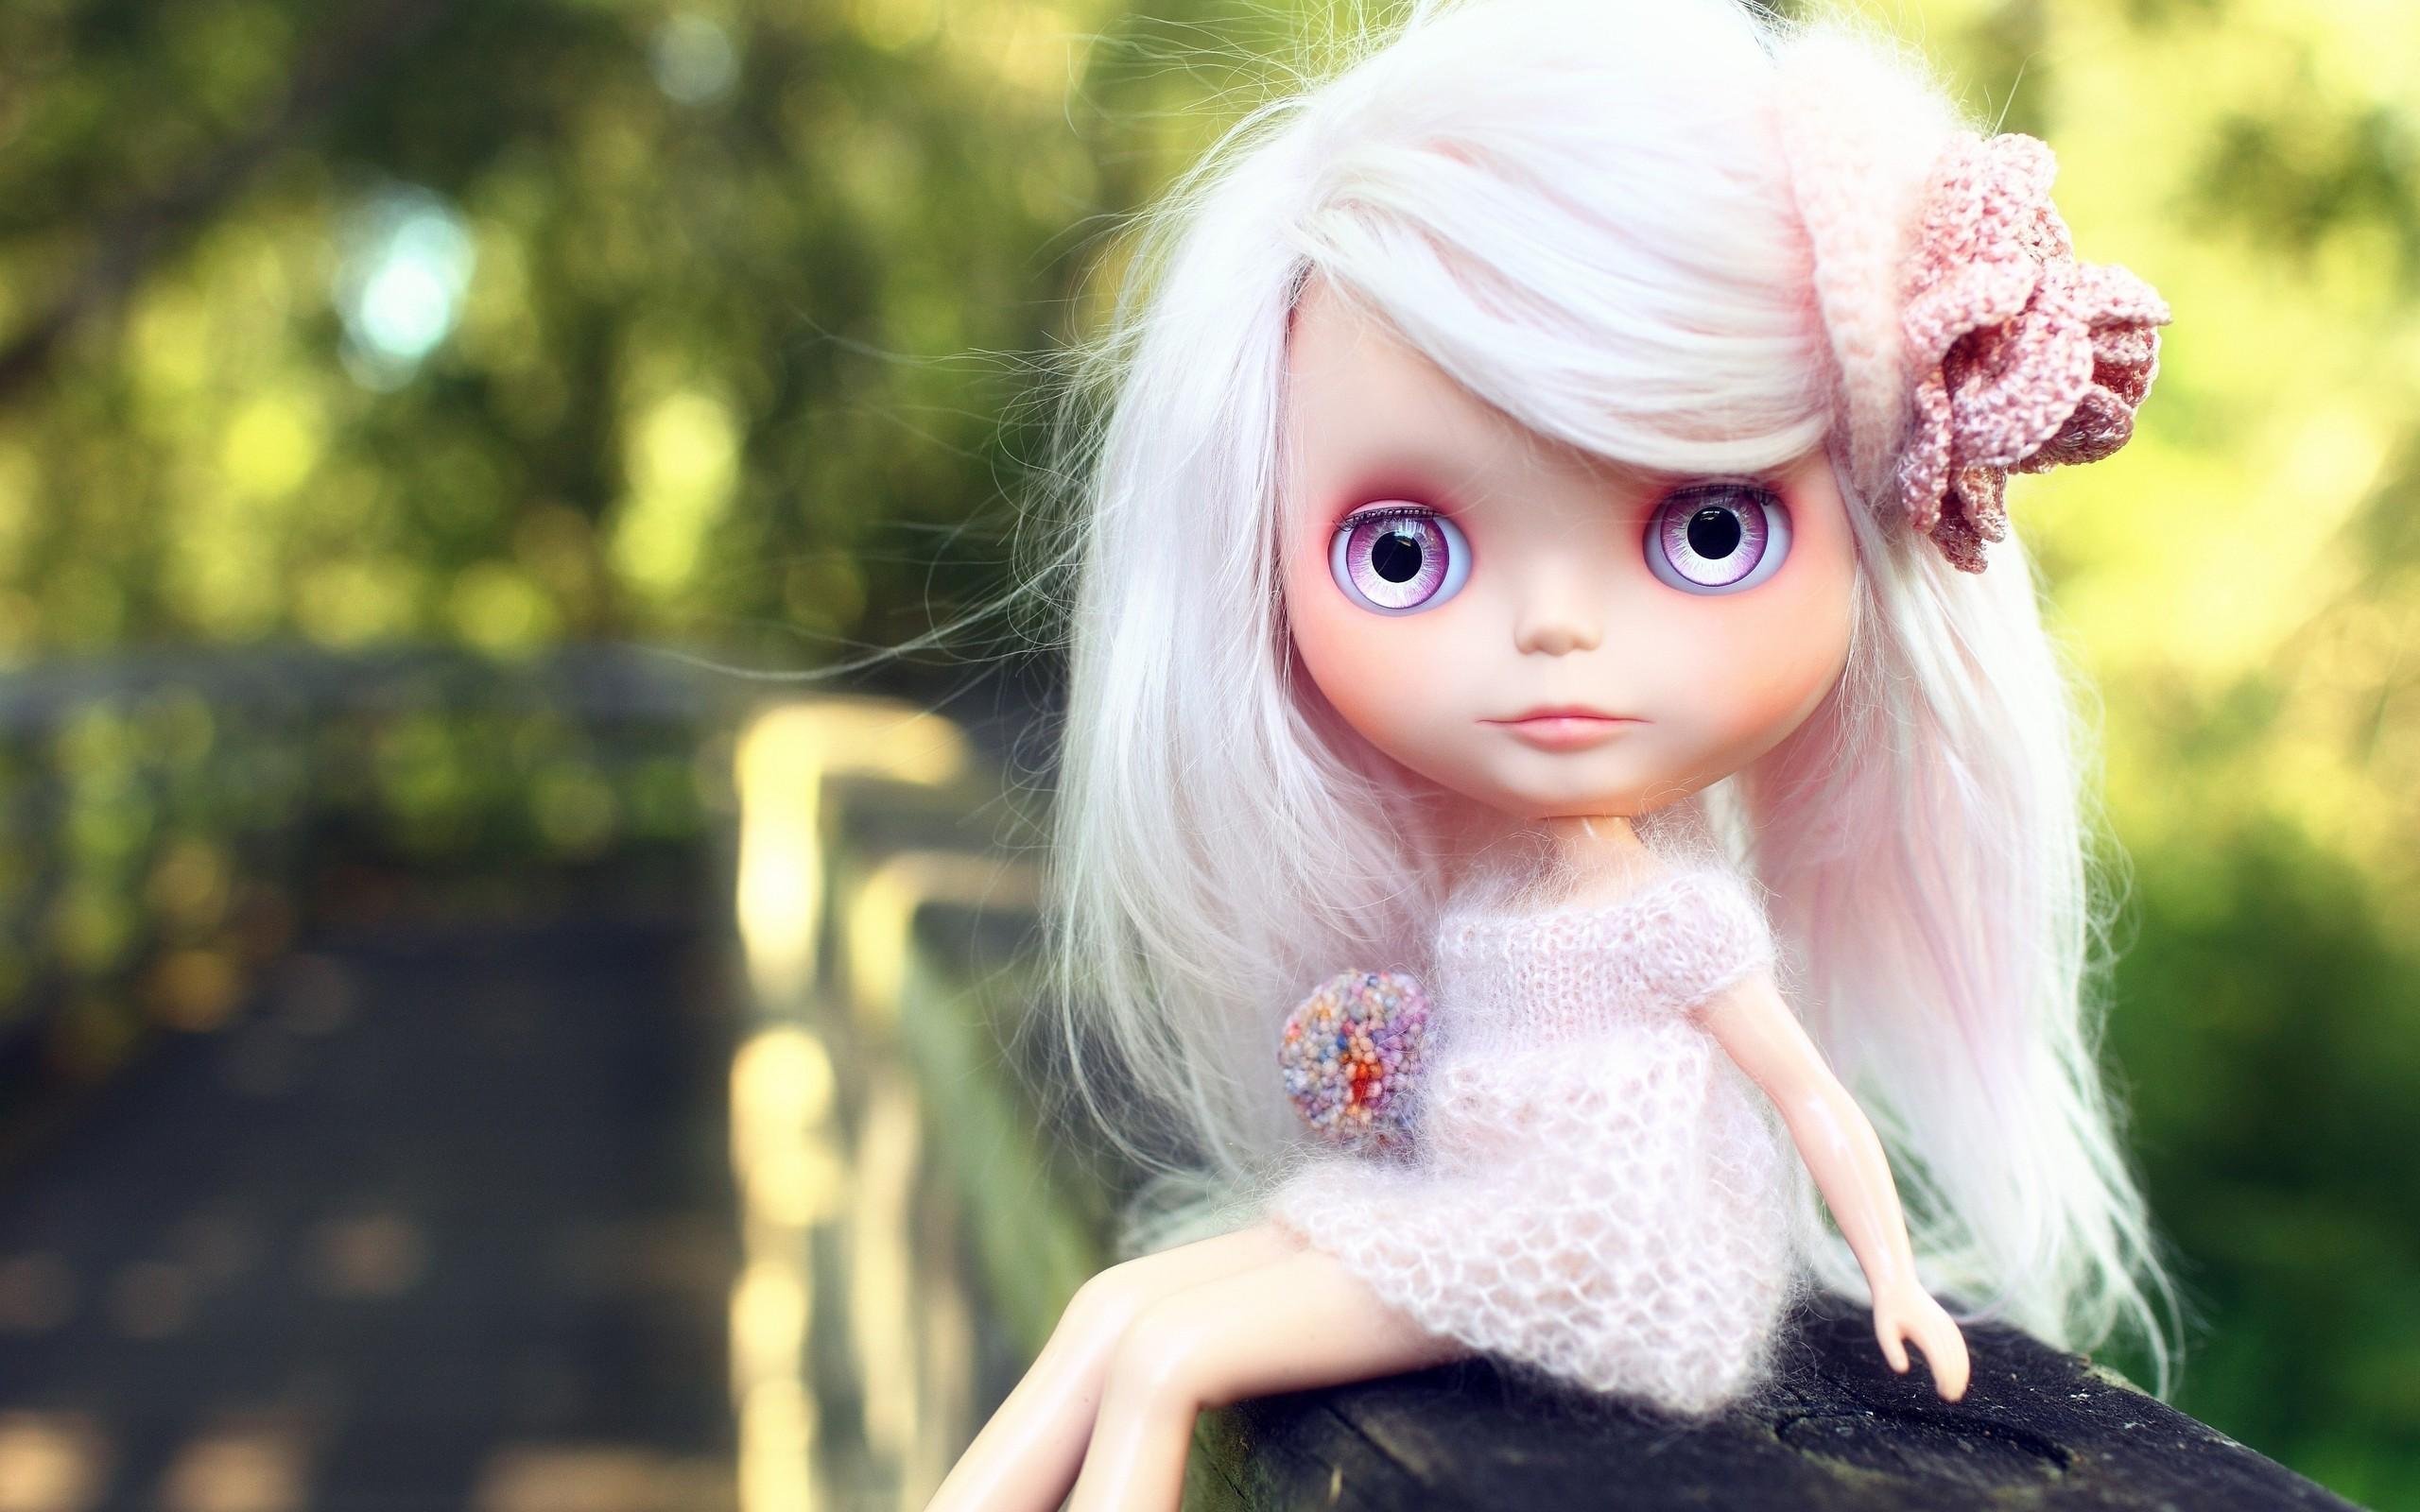 … Wallpapers Pics Barbie Doll Desktop HD .